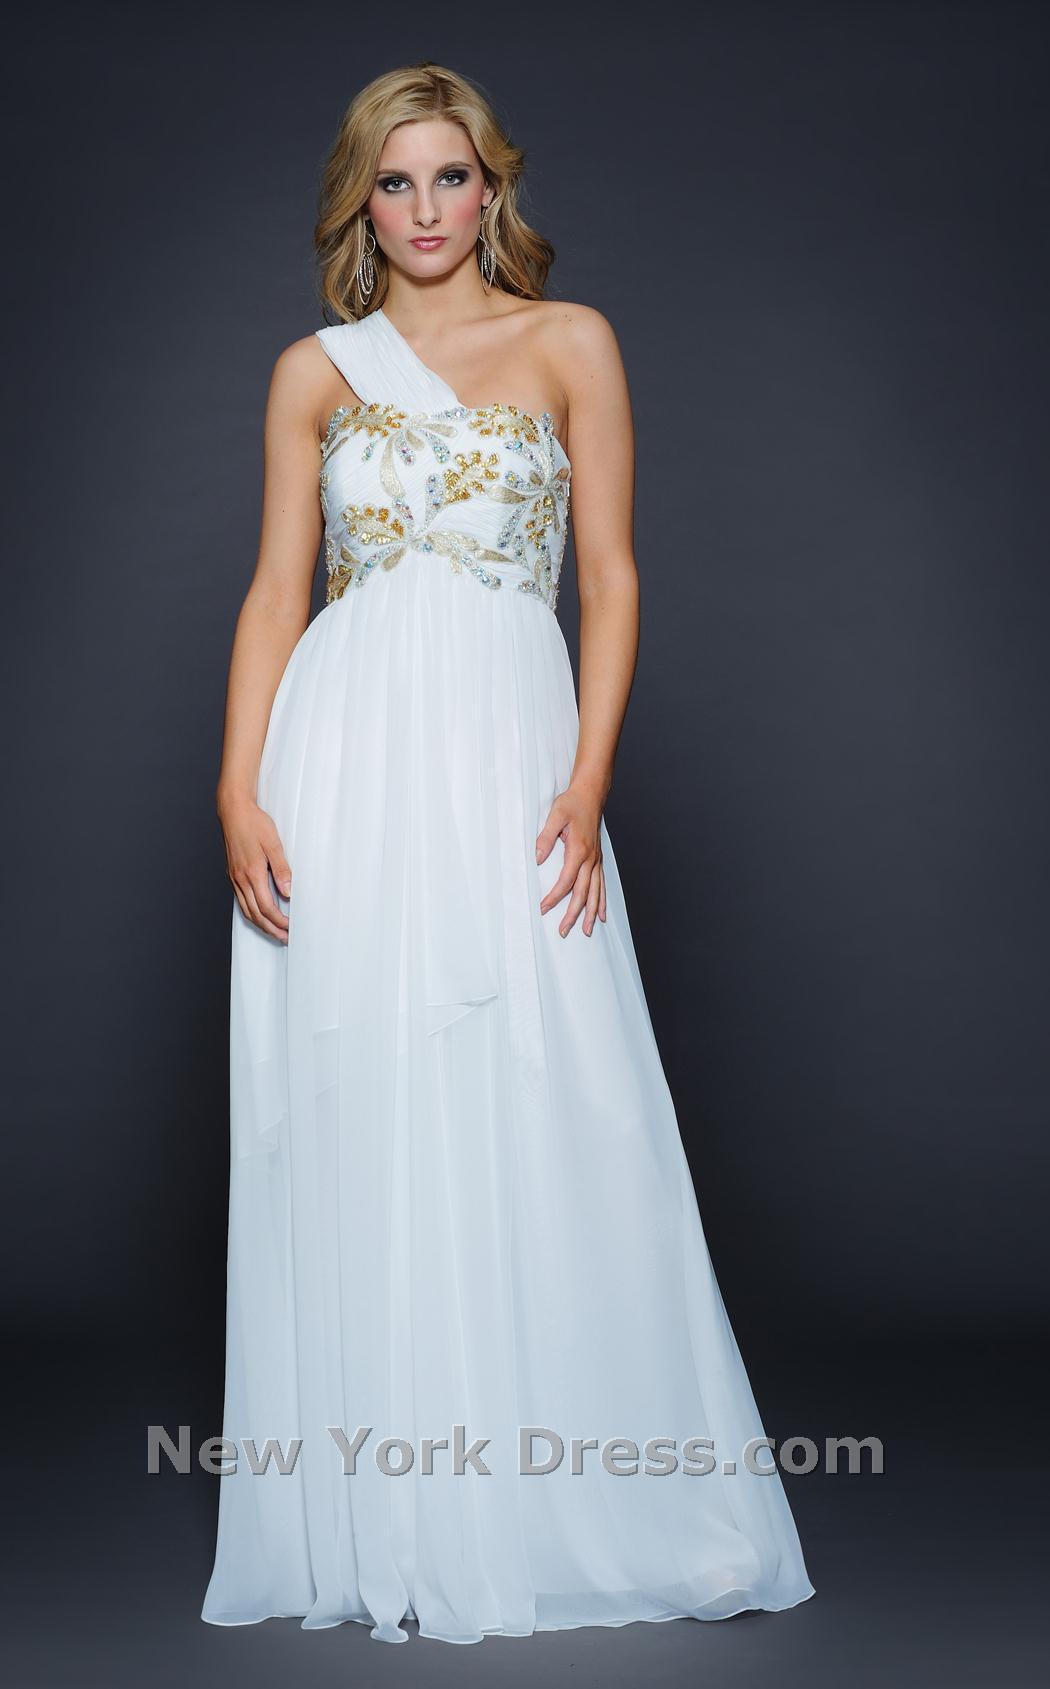 Выпускные платья 2014 года